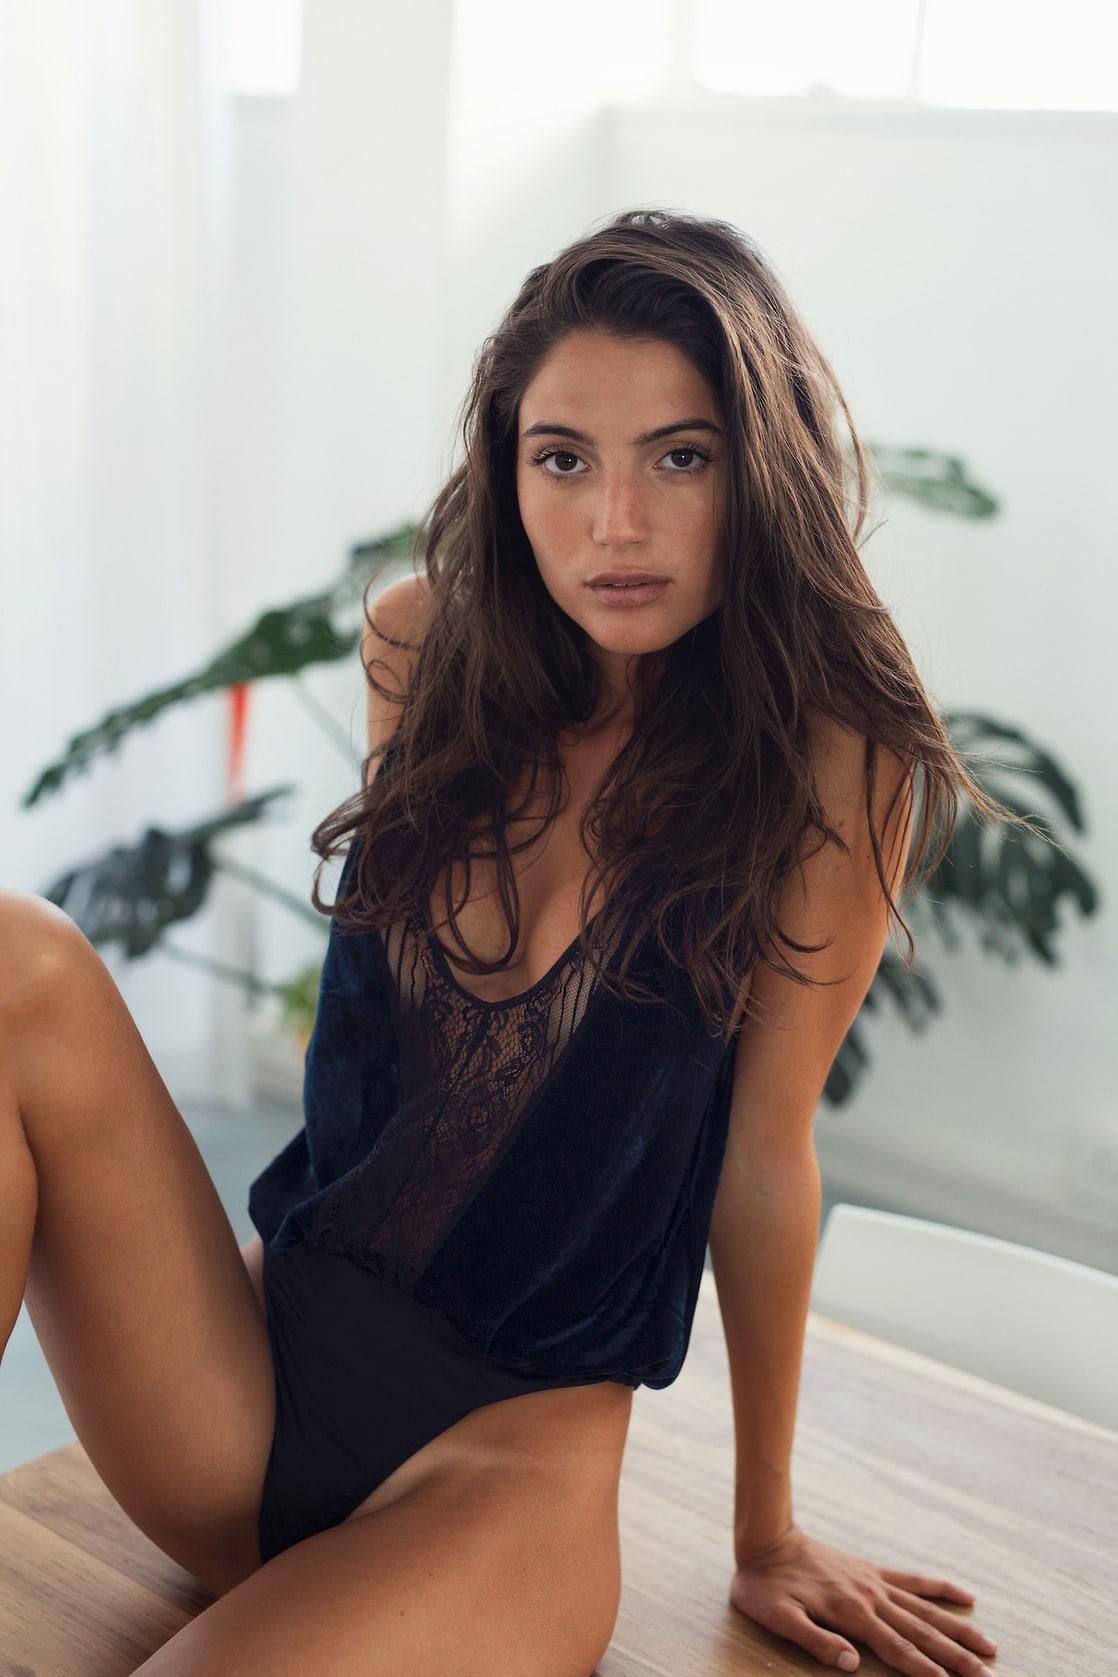 Sideboobs Rafaella Consentino  nudes (26 pics), Snapchat, butt